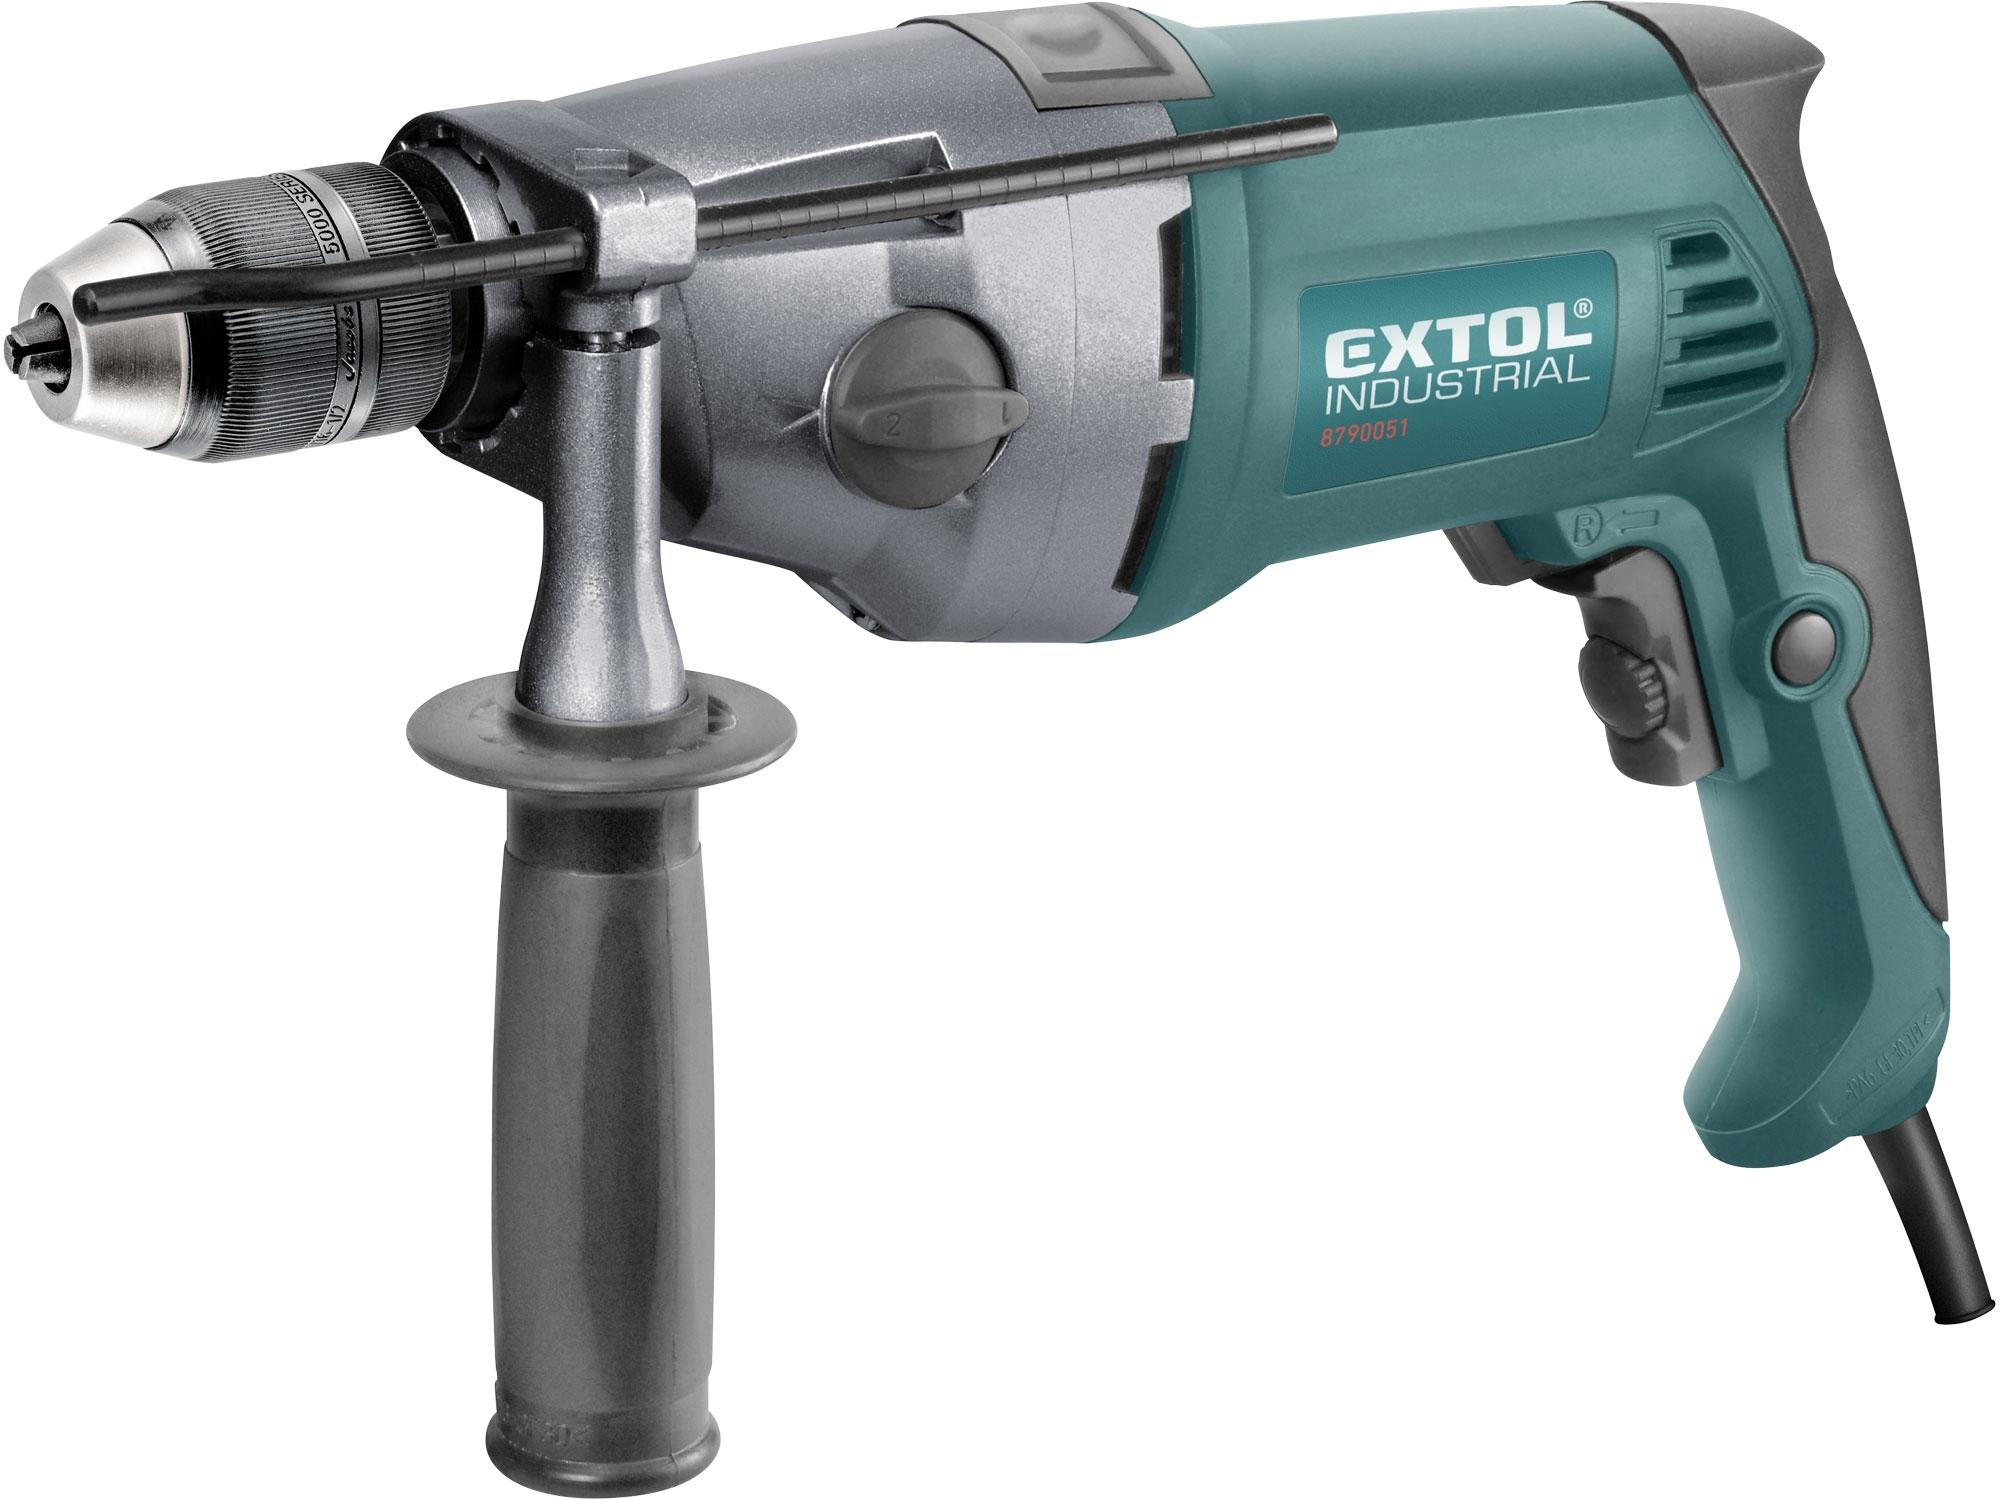 Vrtačka s příklepem 1050W, EXTOL Industrial HDD 1050 C 8790051